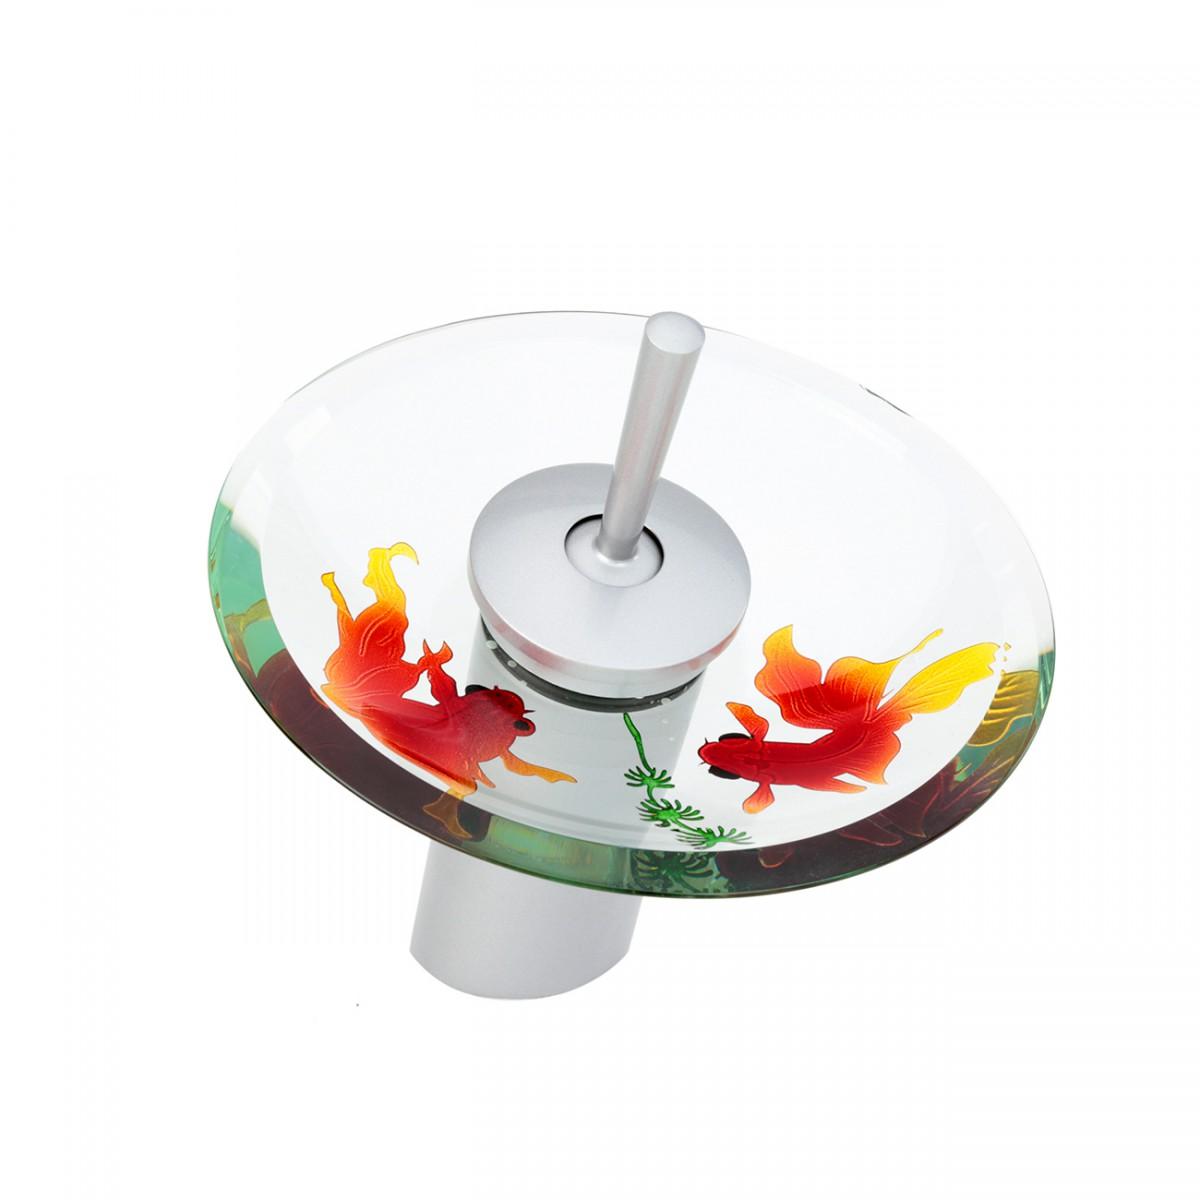 Waterfall Faucet Cast Brass Satin Nickel 7 H Short Koi Fish Glass plate Waterfall Sink Faucet Waterfall Bathroom Faucets Glass Disk Faucet